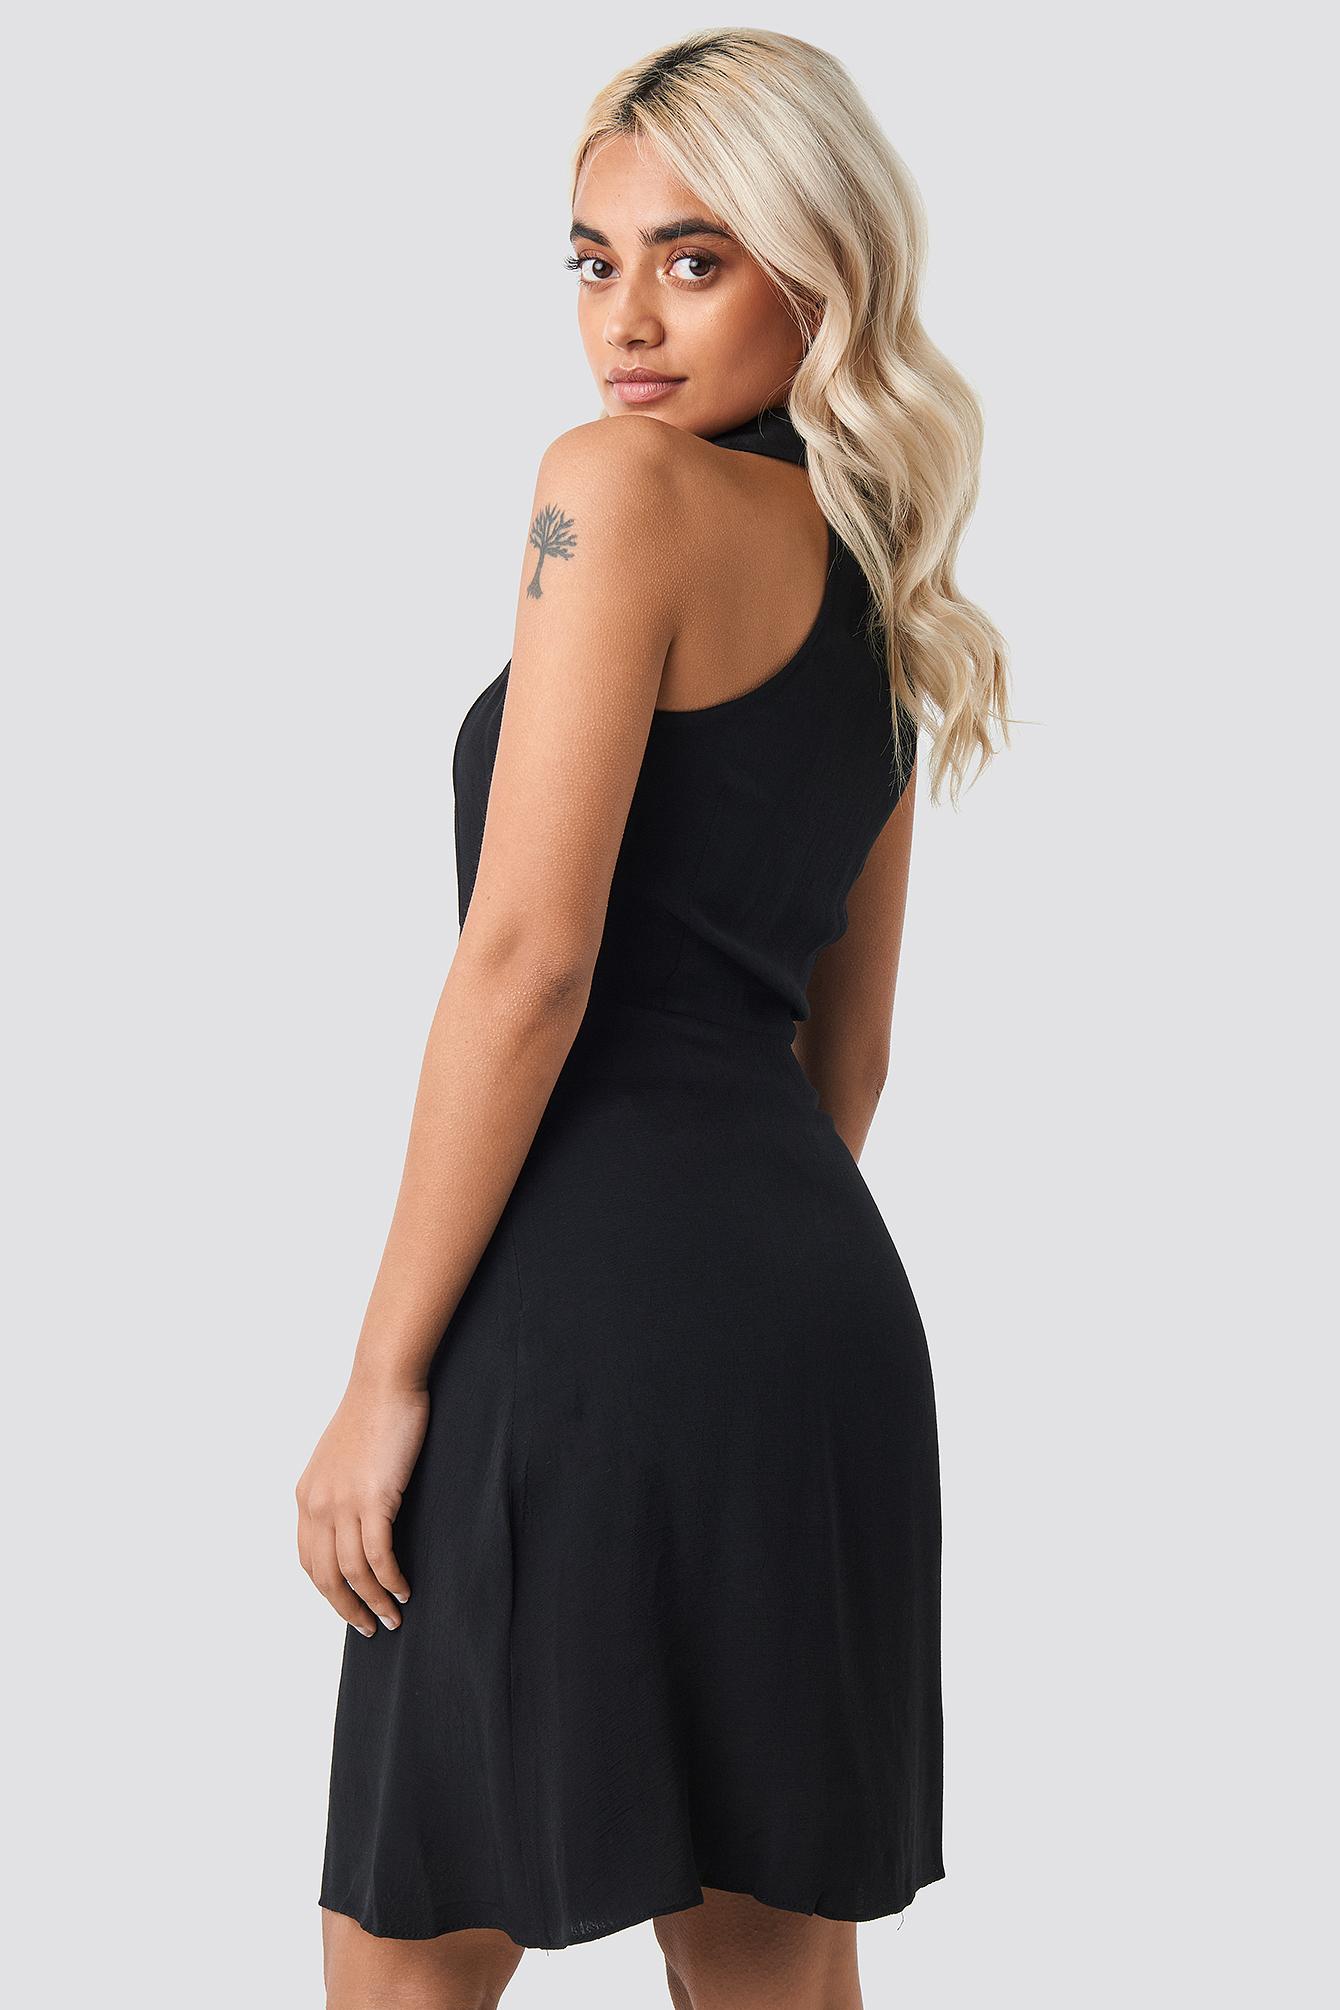 Shoulder Detail Mini Dress NA-KD.COM